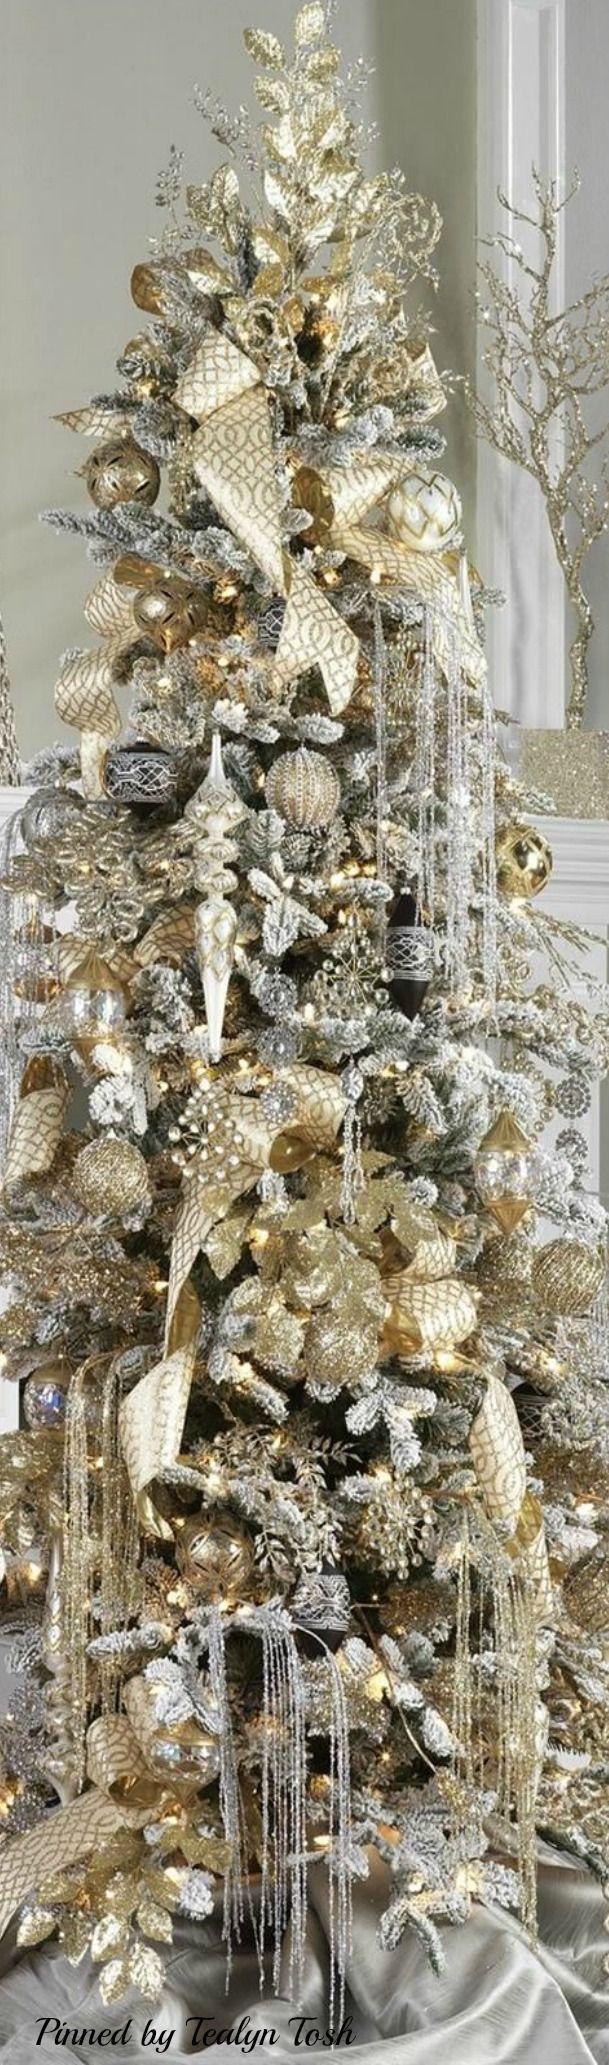 Stylish Elegant Glitzy Gold & Silver